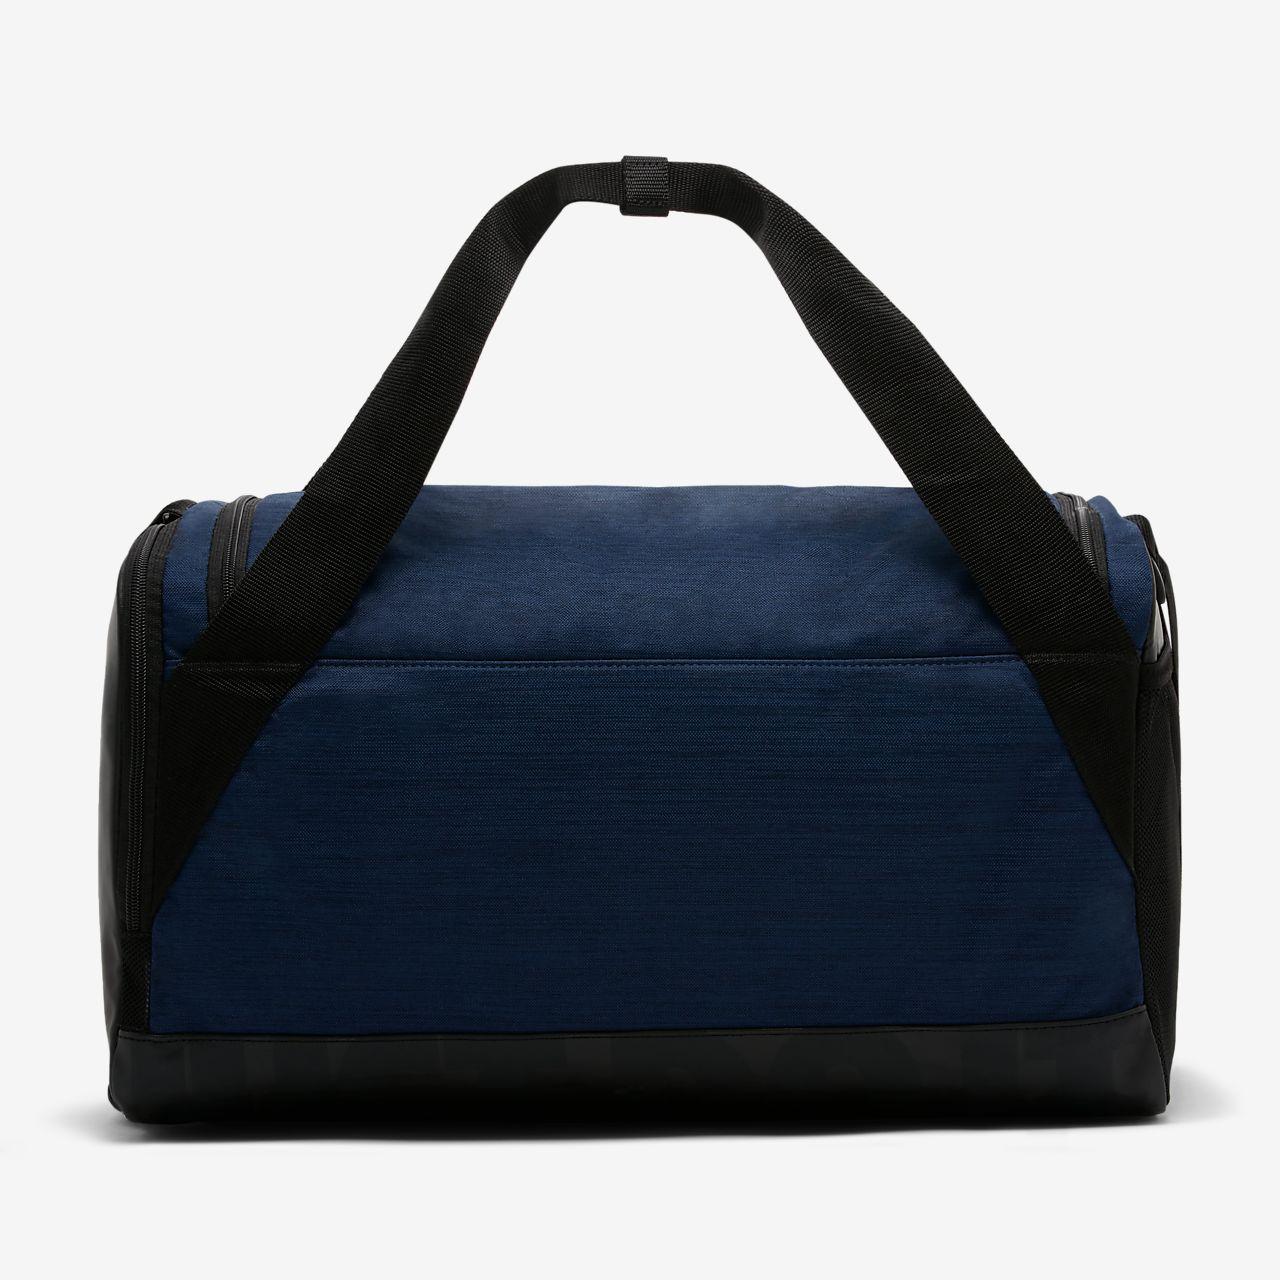 838439c55000 Nike Brasilia (Small) Training Duffel Bag